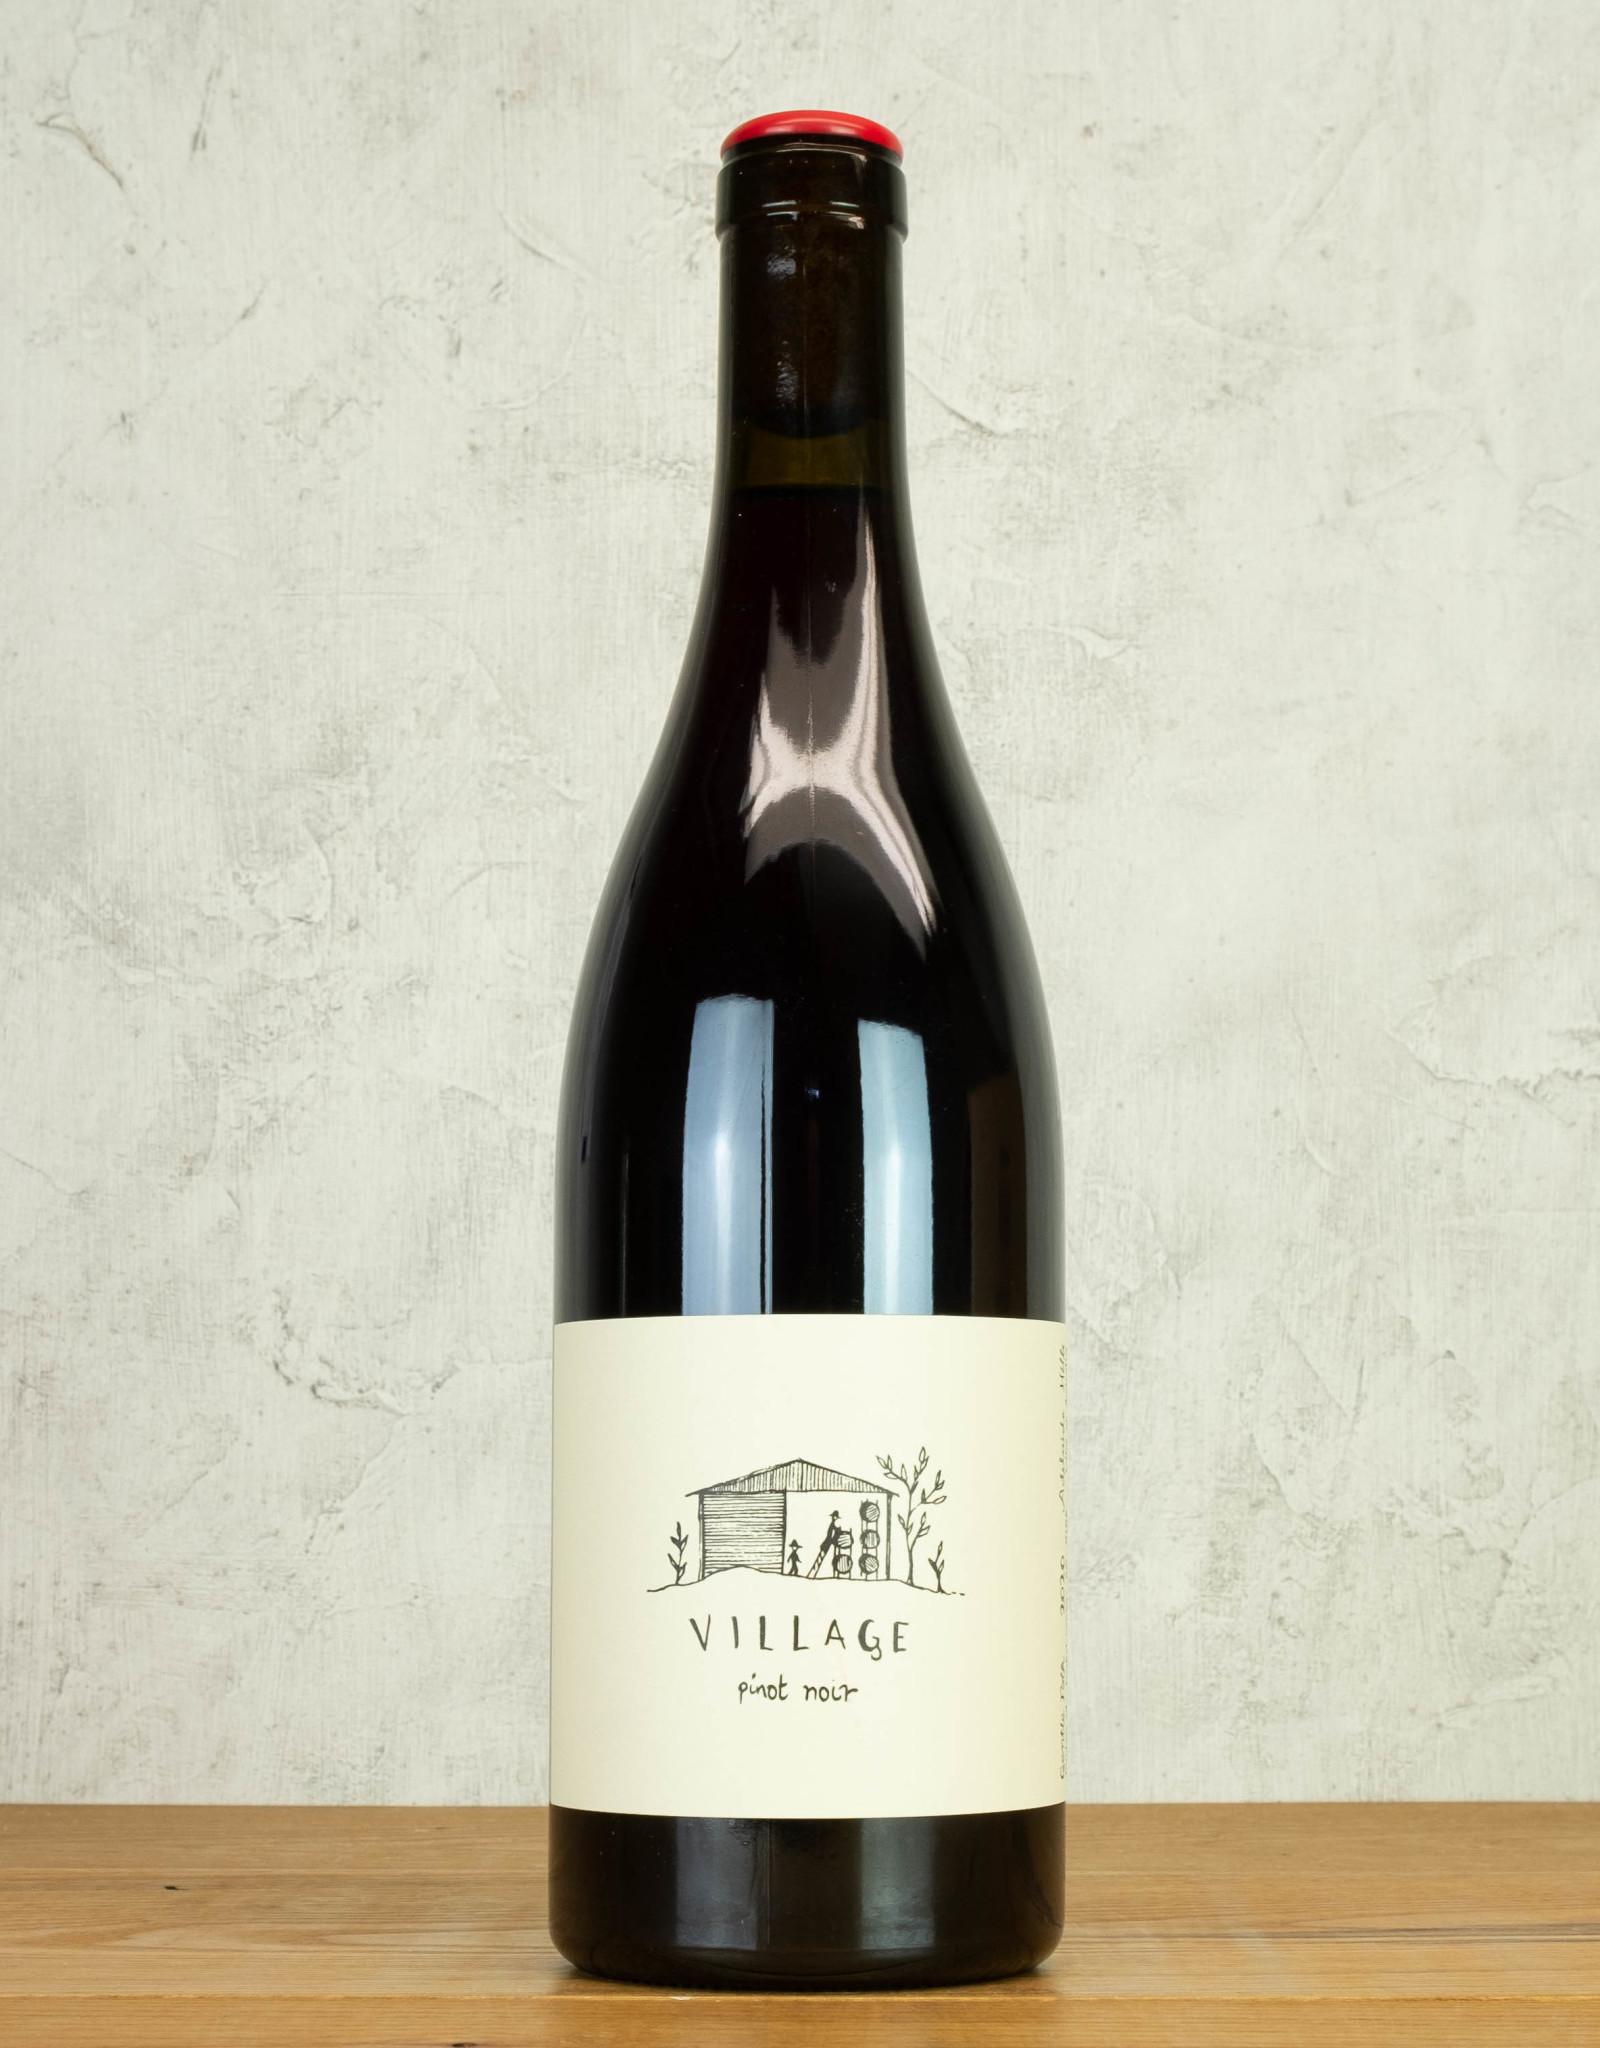 Gentle Folk Village Pinot Noir